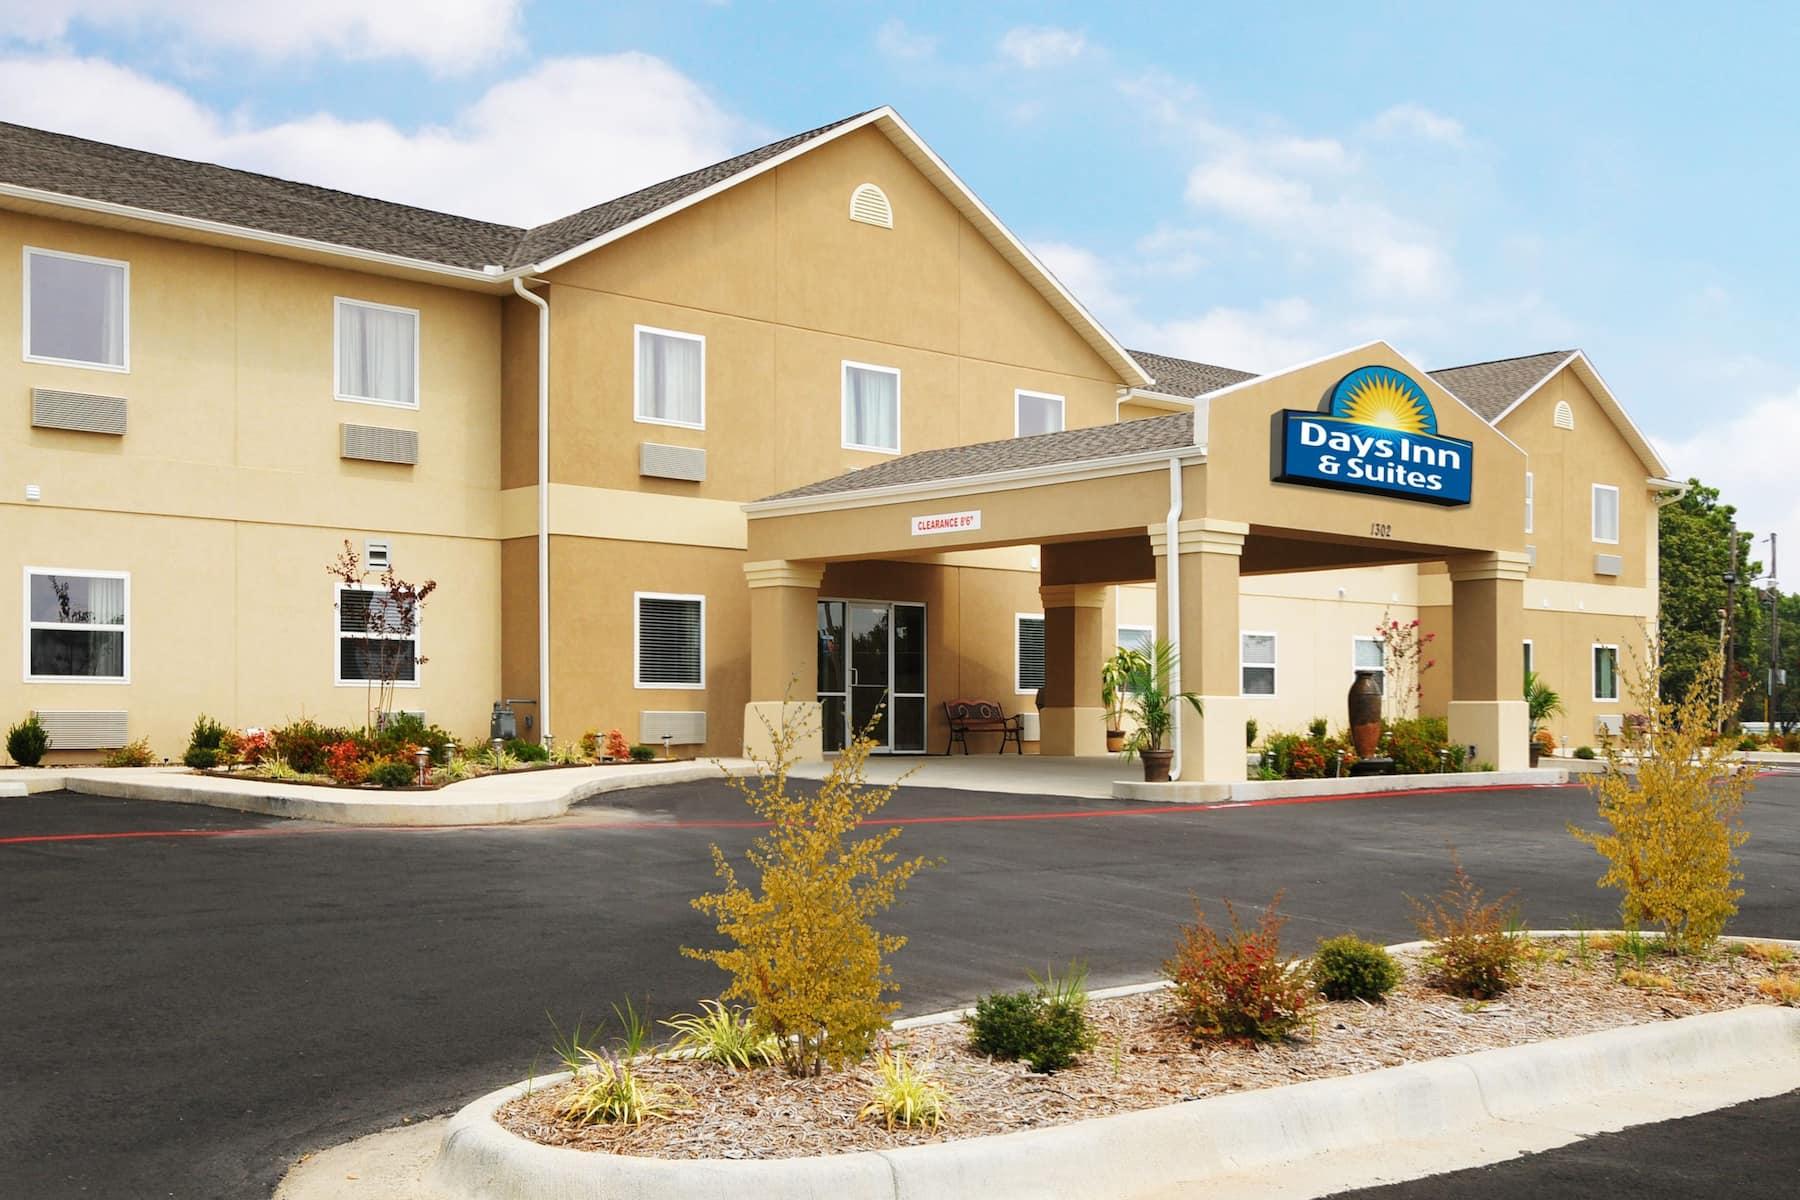 Exterior of Days Inn & Suites by Wyndham Cabot hotel in Cabot, Arkansas